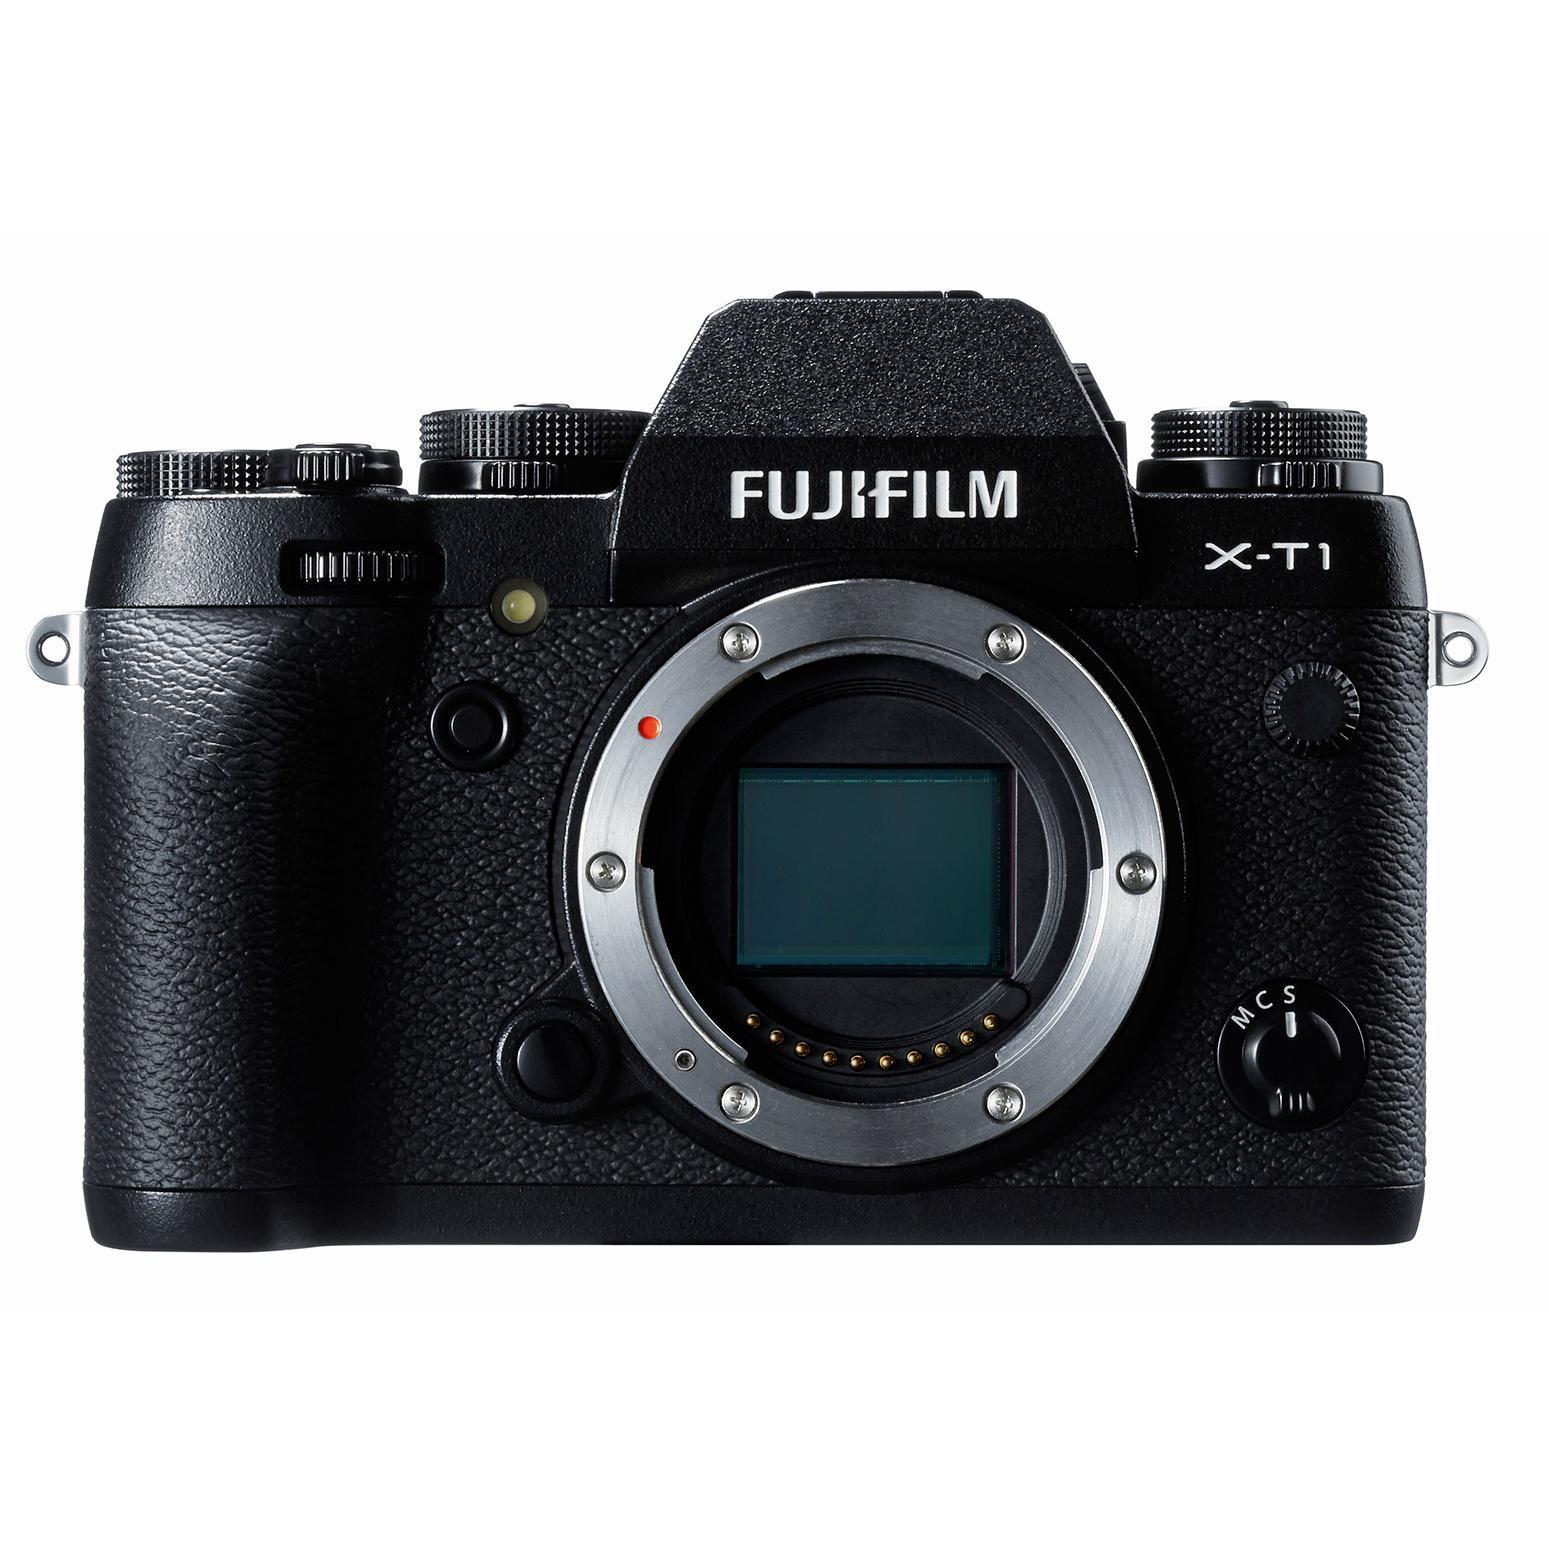 Fujifilm X-T1 Hybrid 16Mpx - Black